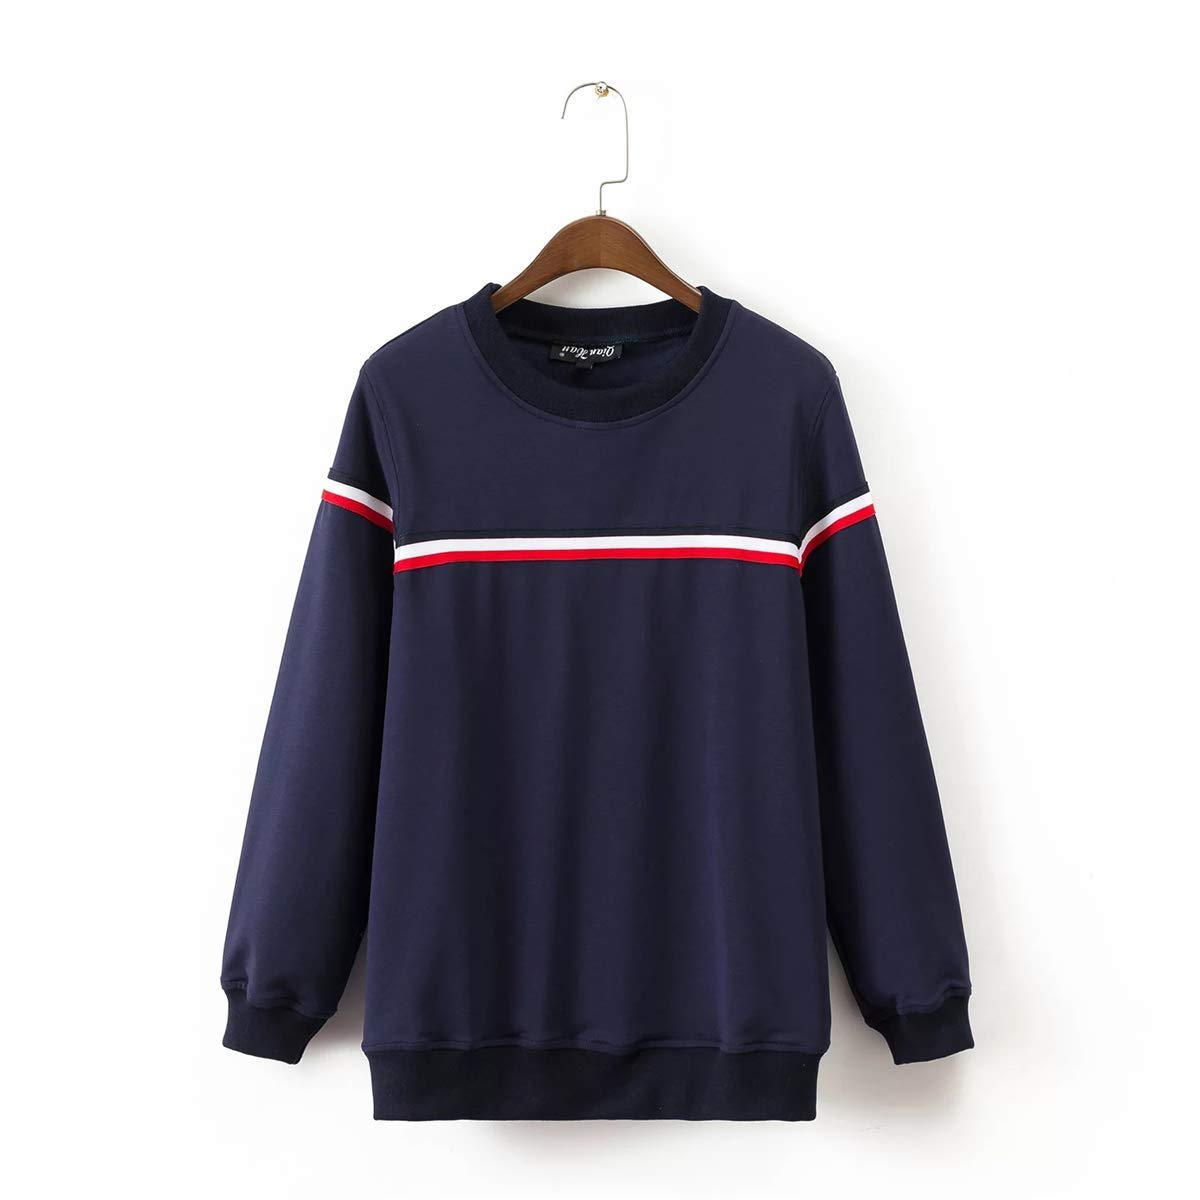 Bleu Marine X-petit FCYOSO - Sweat-Shirt - Fille